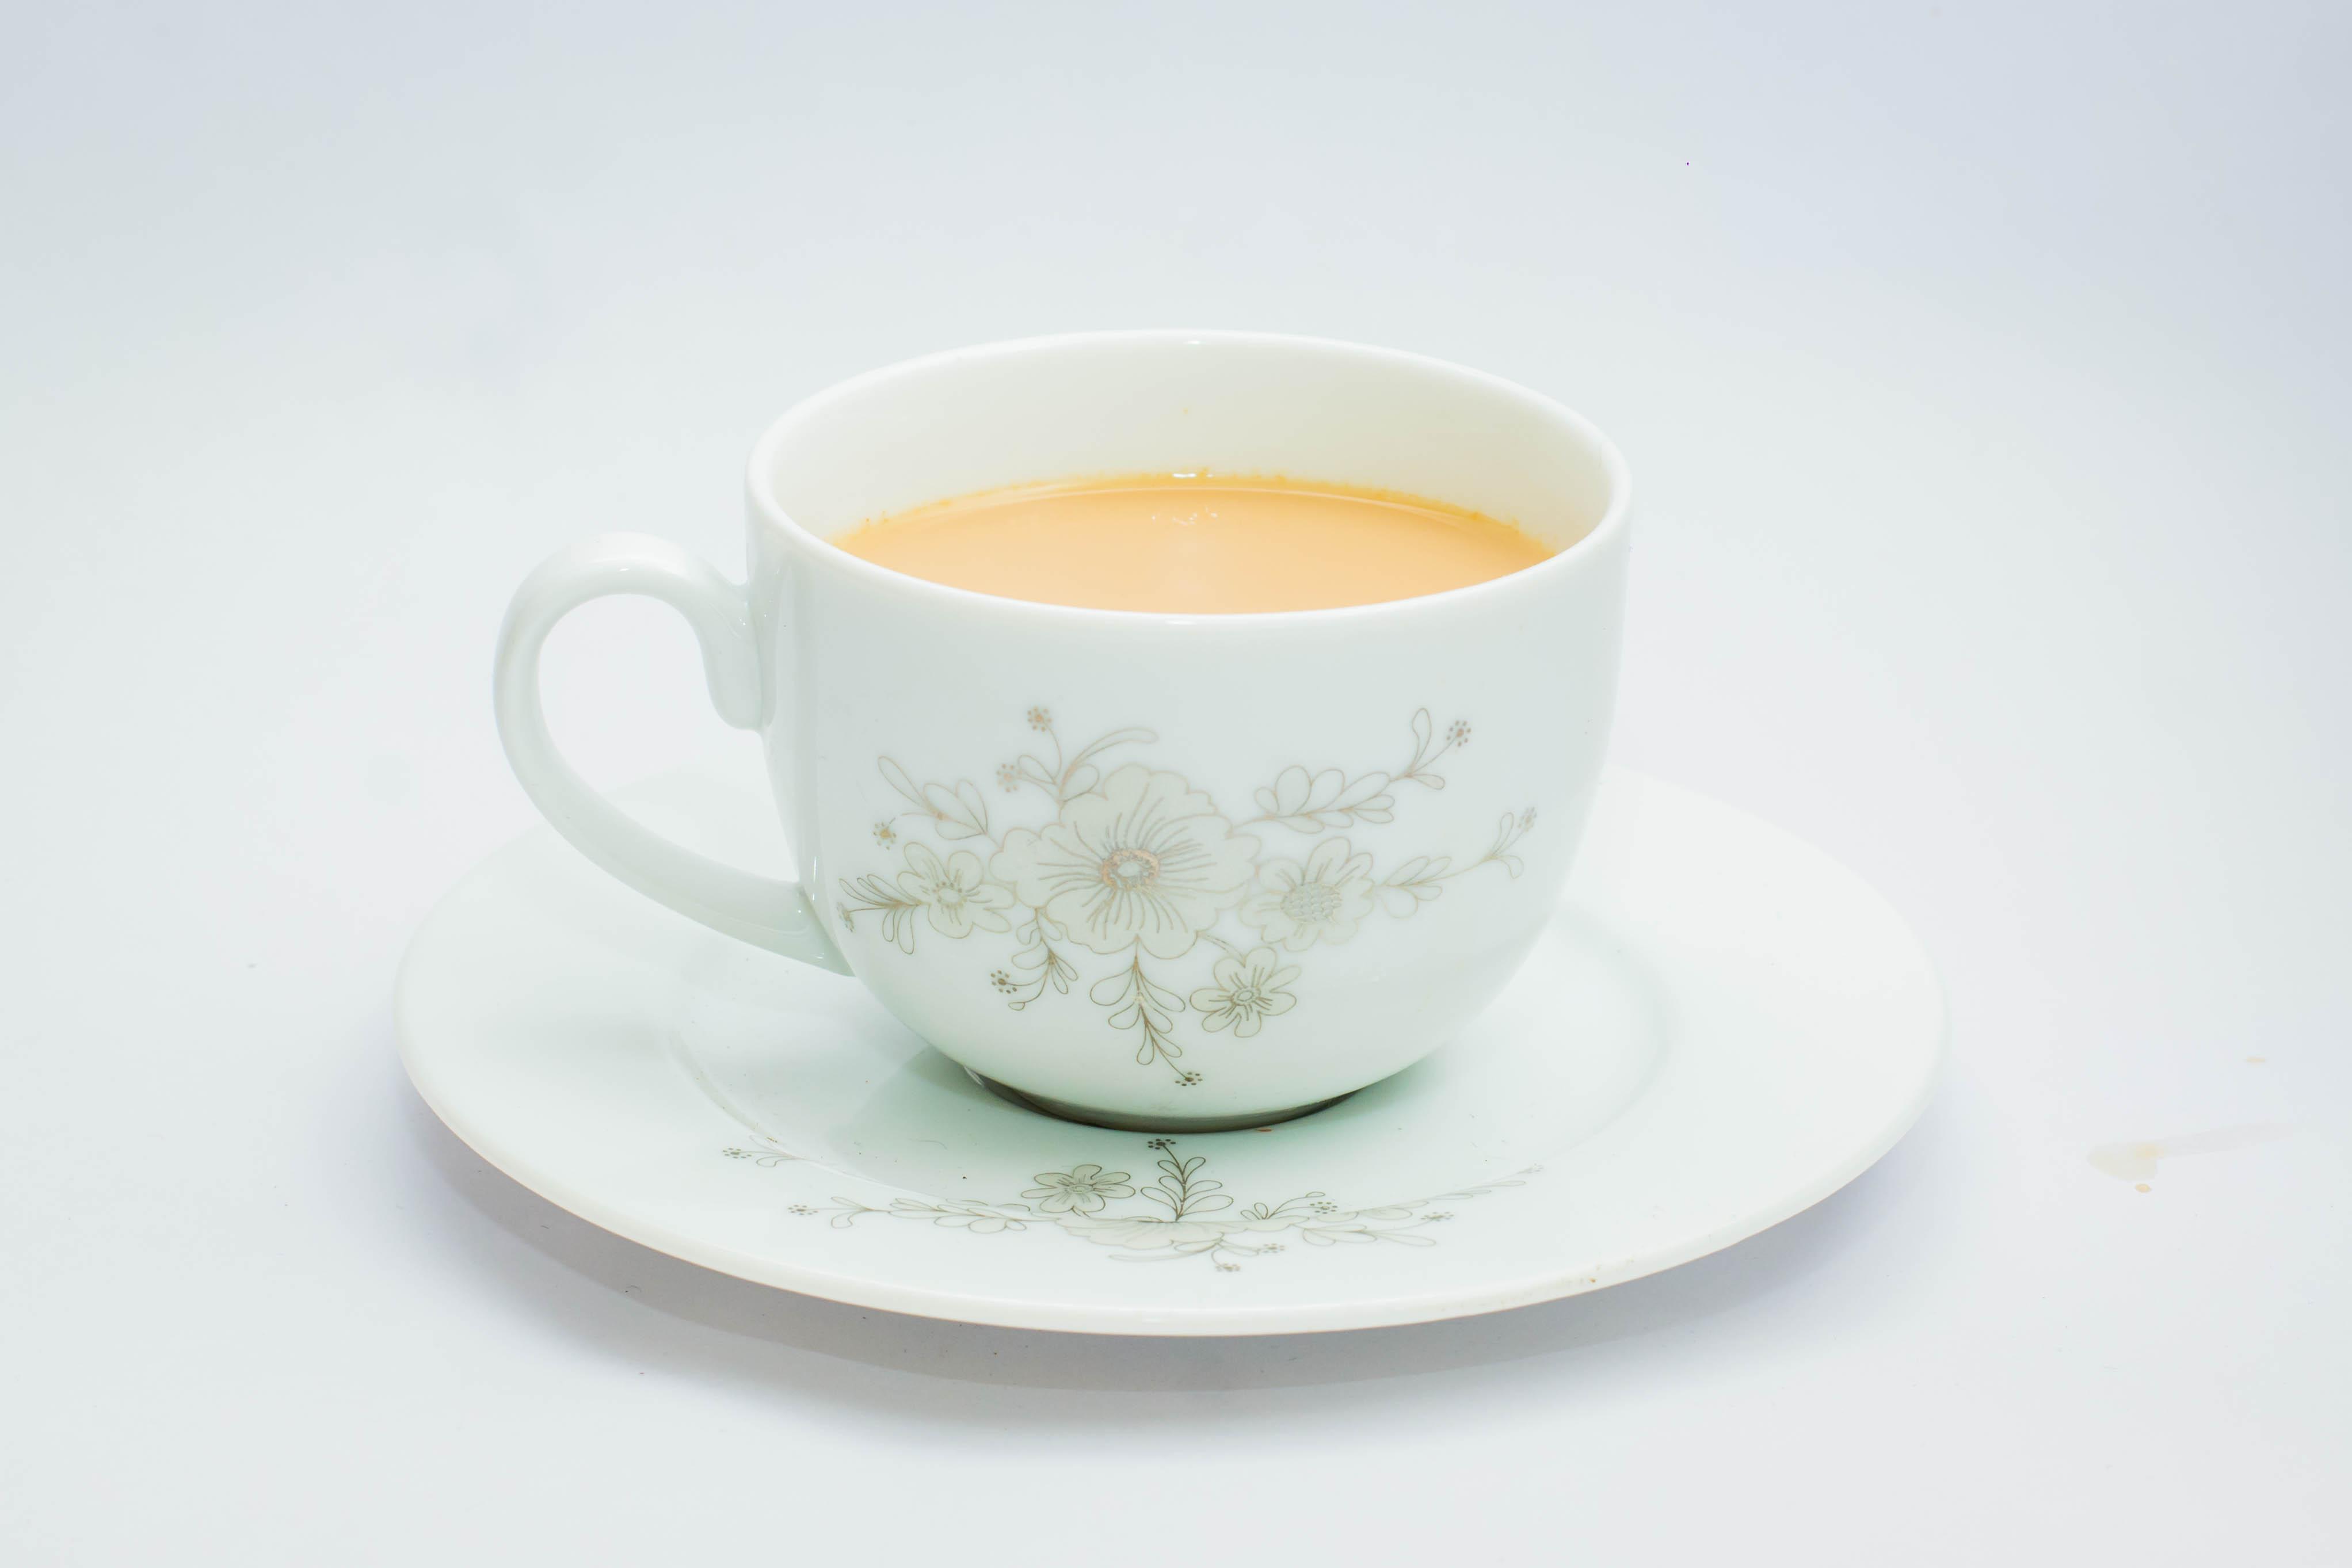 File:Milk tea white cup.jpg - Wikimedia Commons